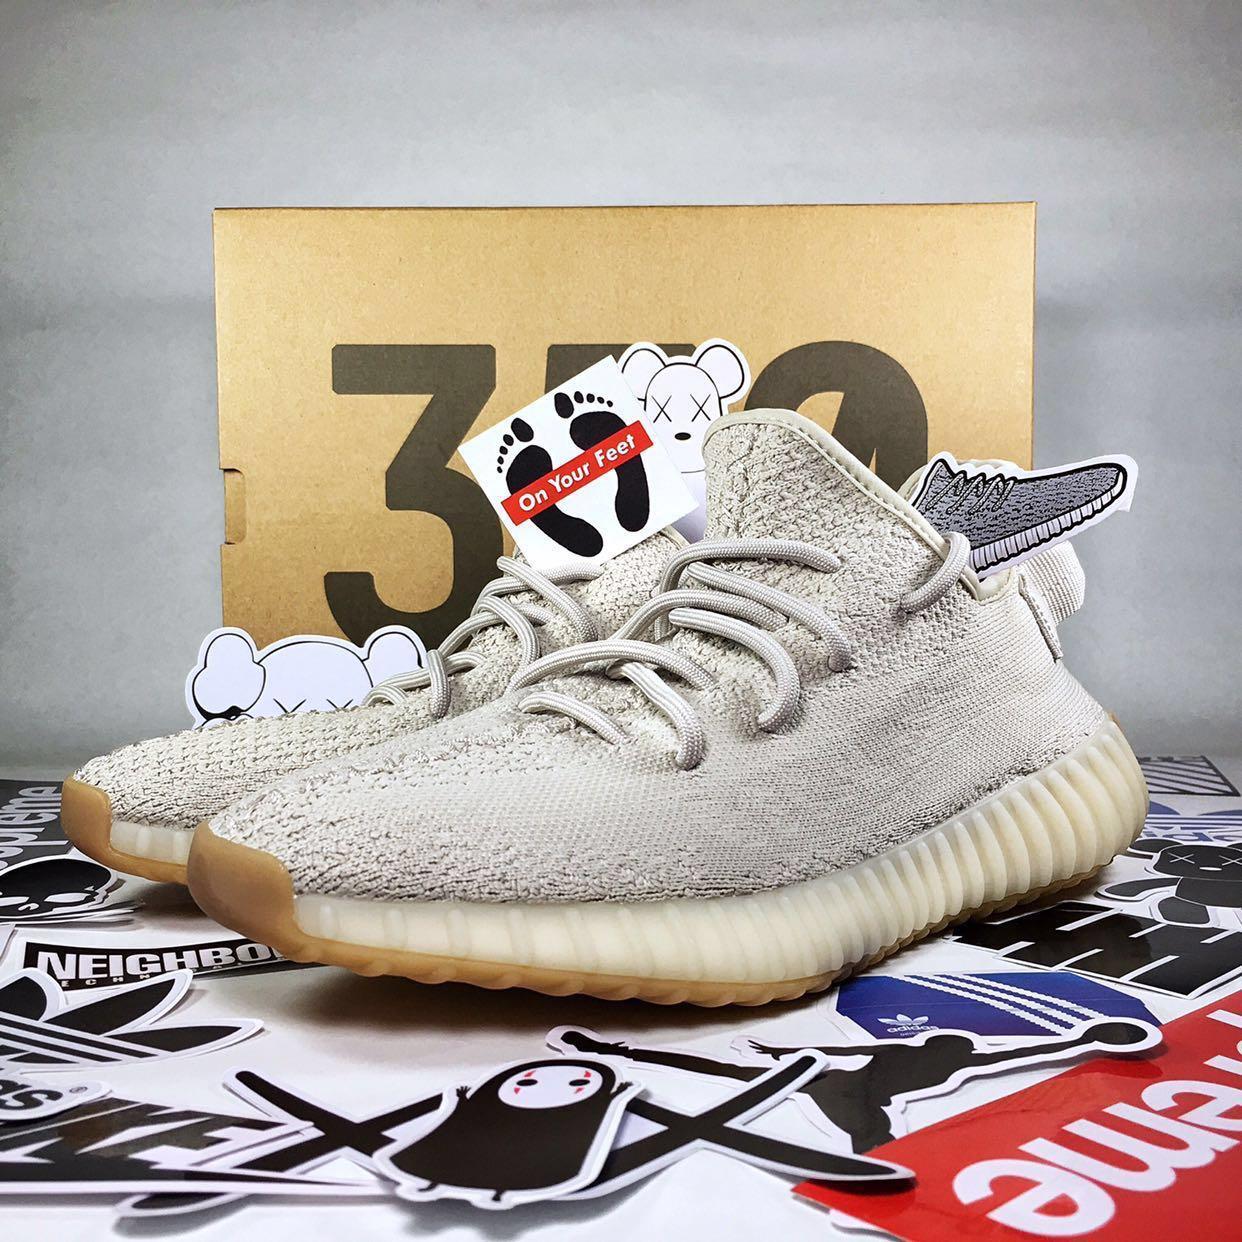 c0c99f95e47de SELLING  Adidas Yeezy Boost 350 V2 Sesame